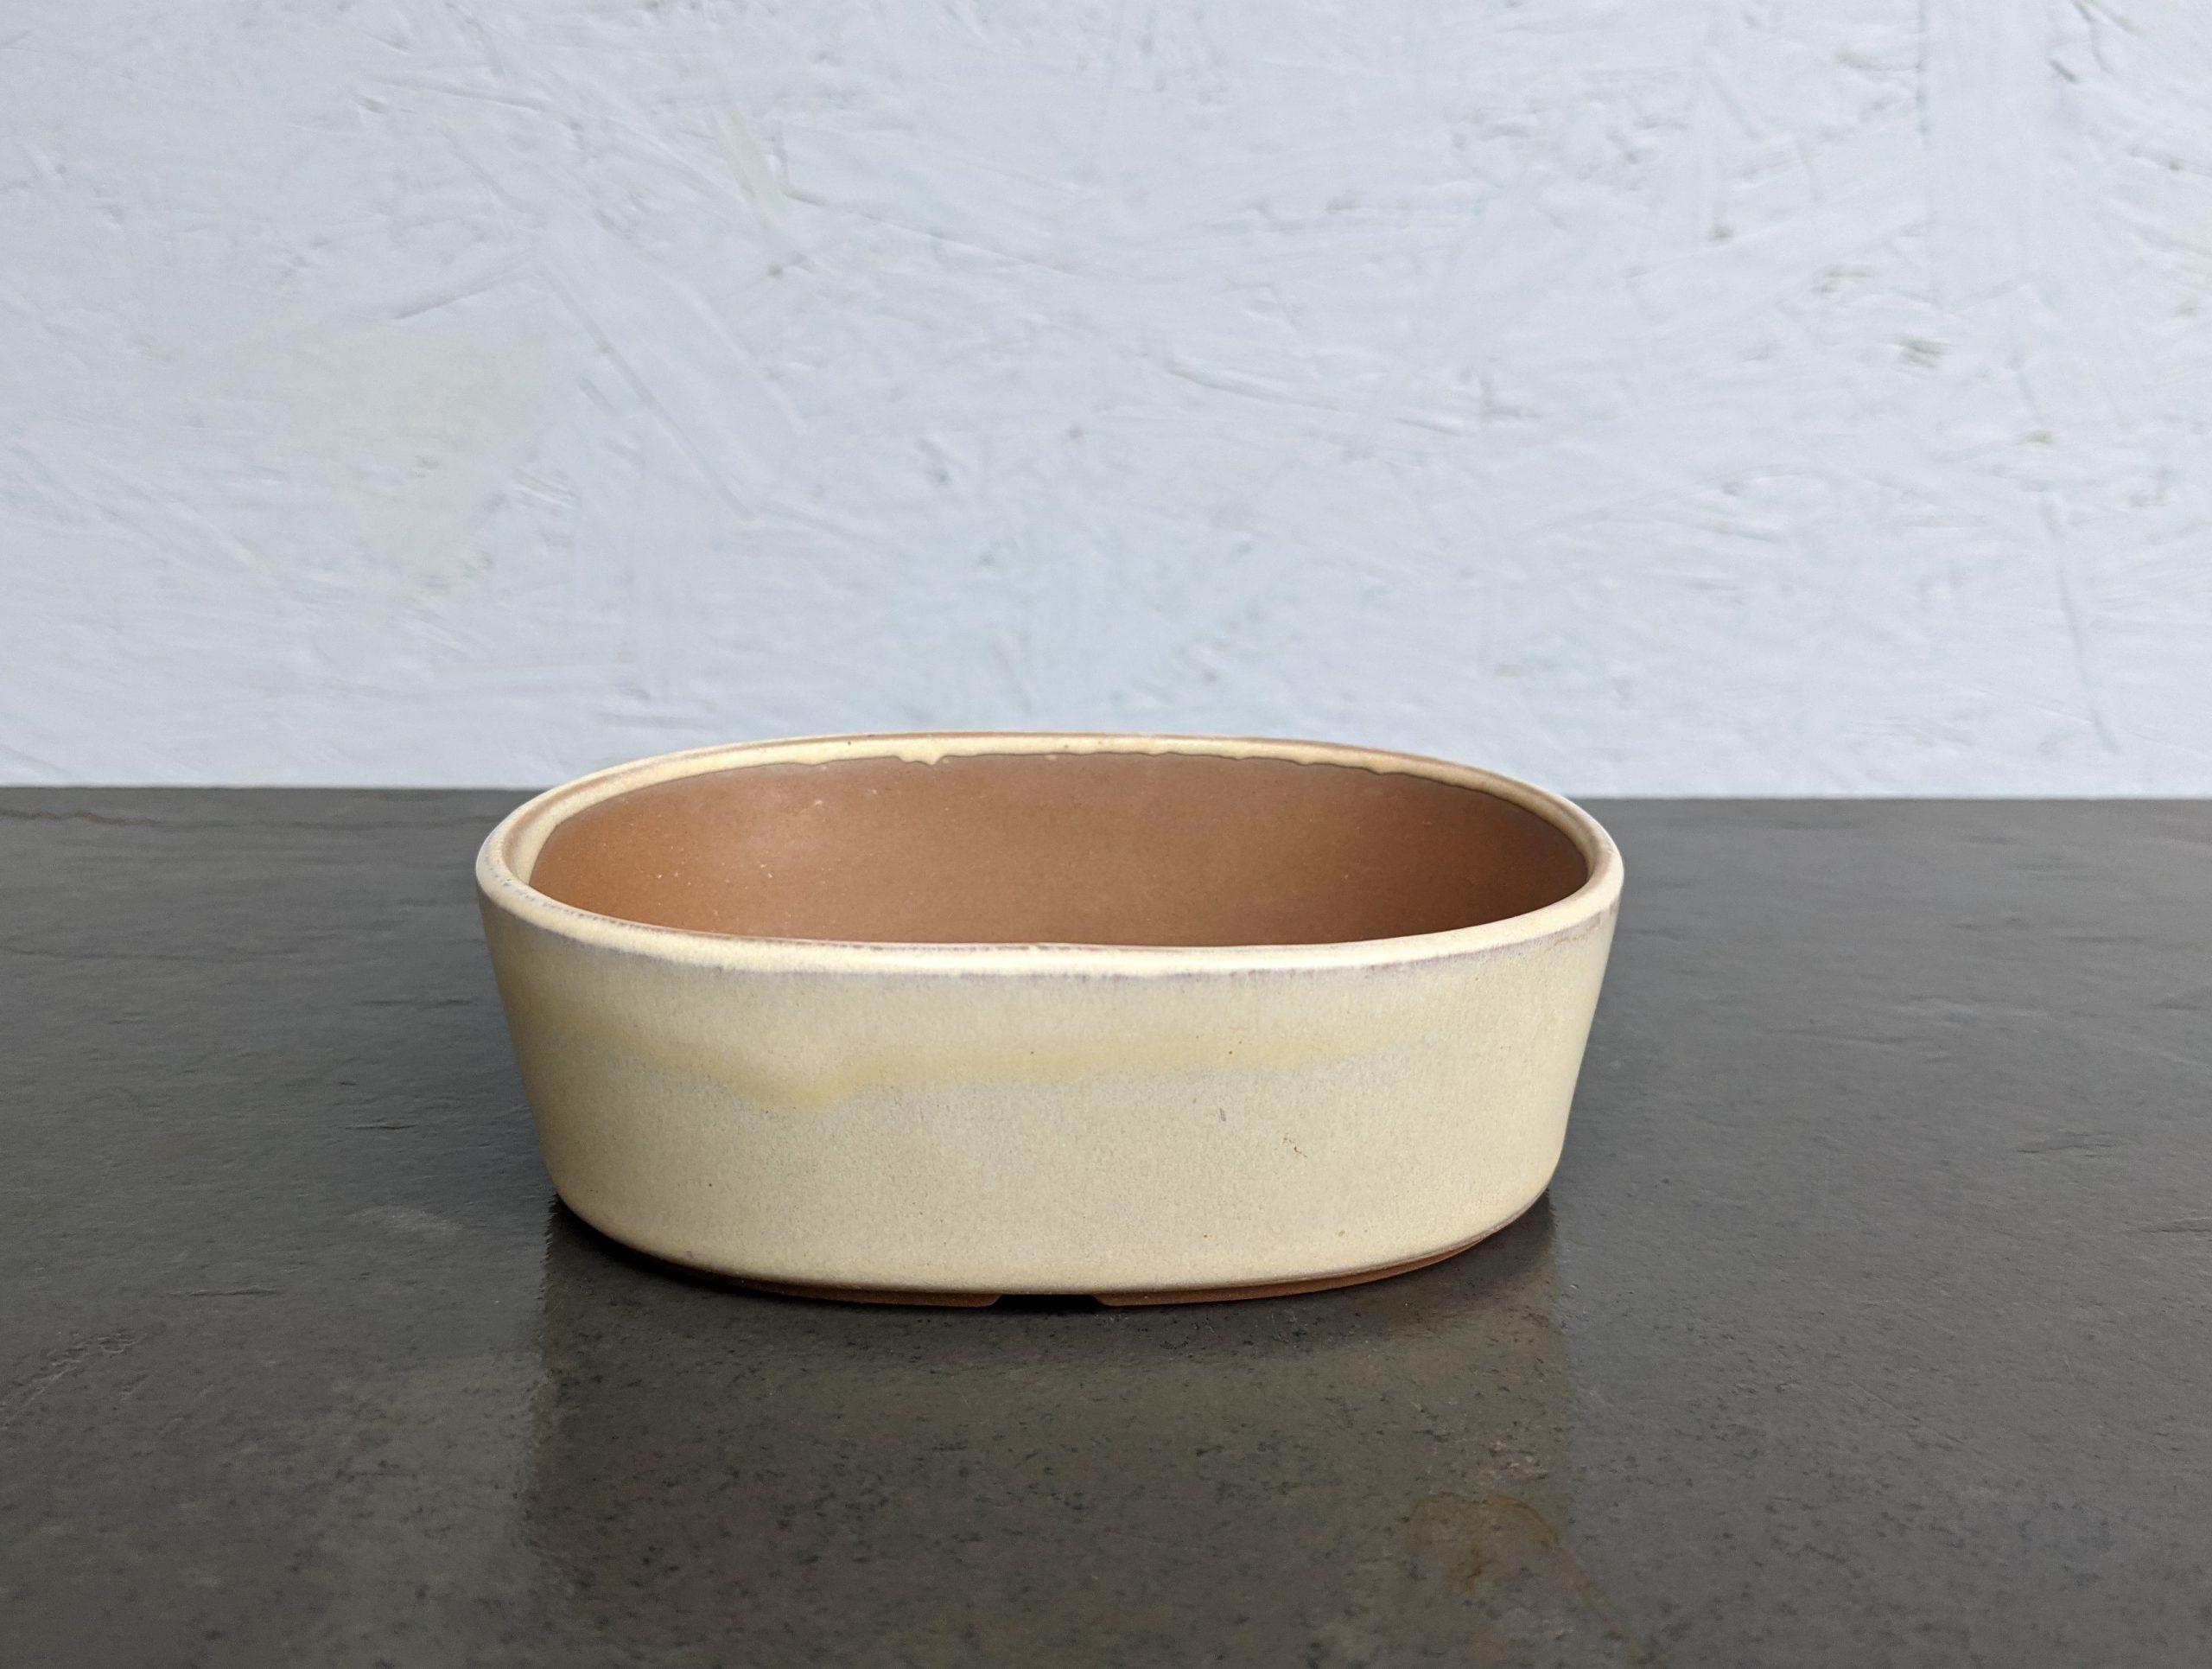 Japanese Slip moulded Cream Oval